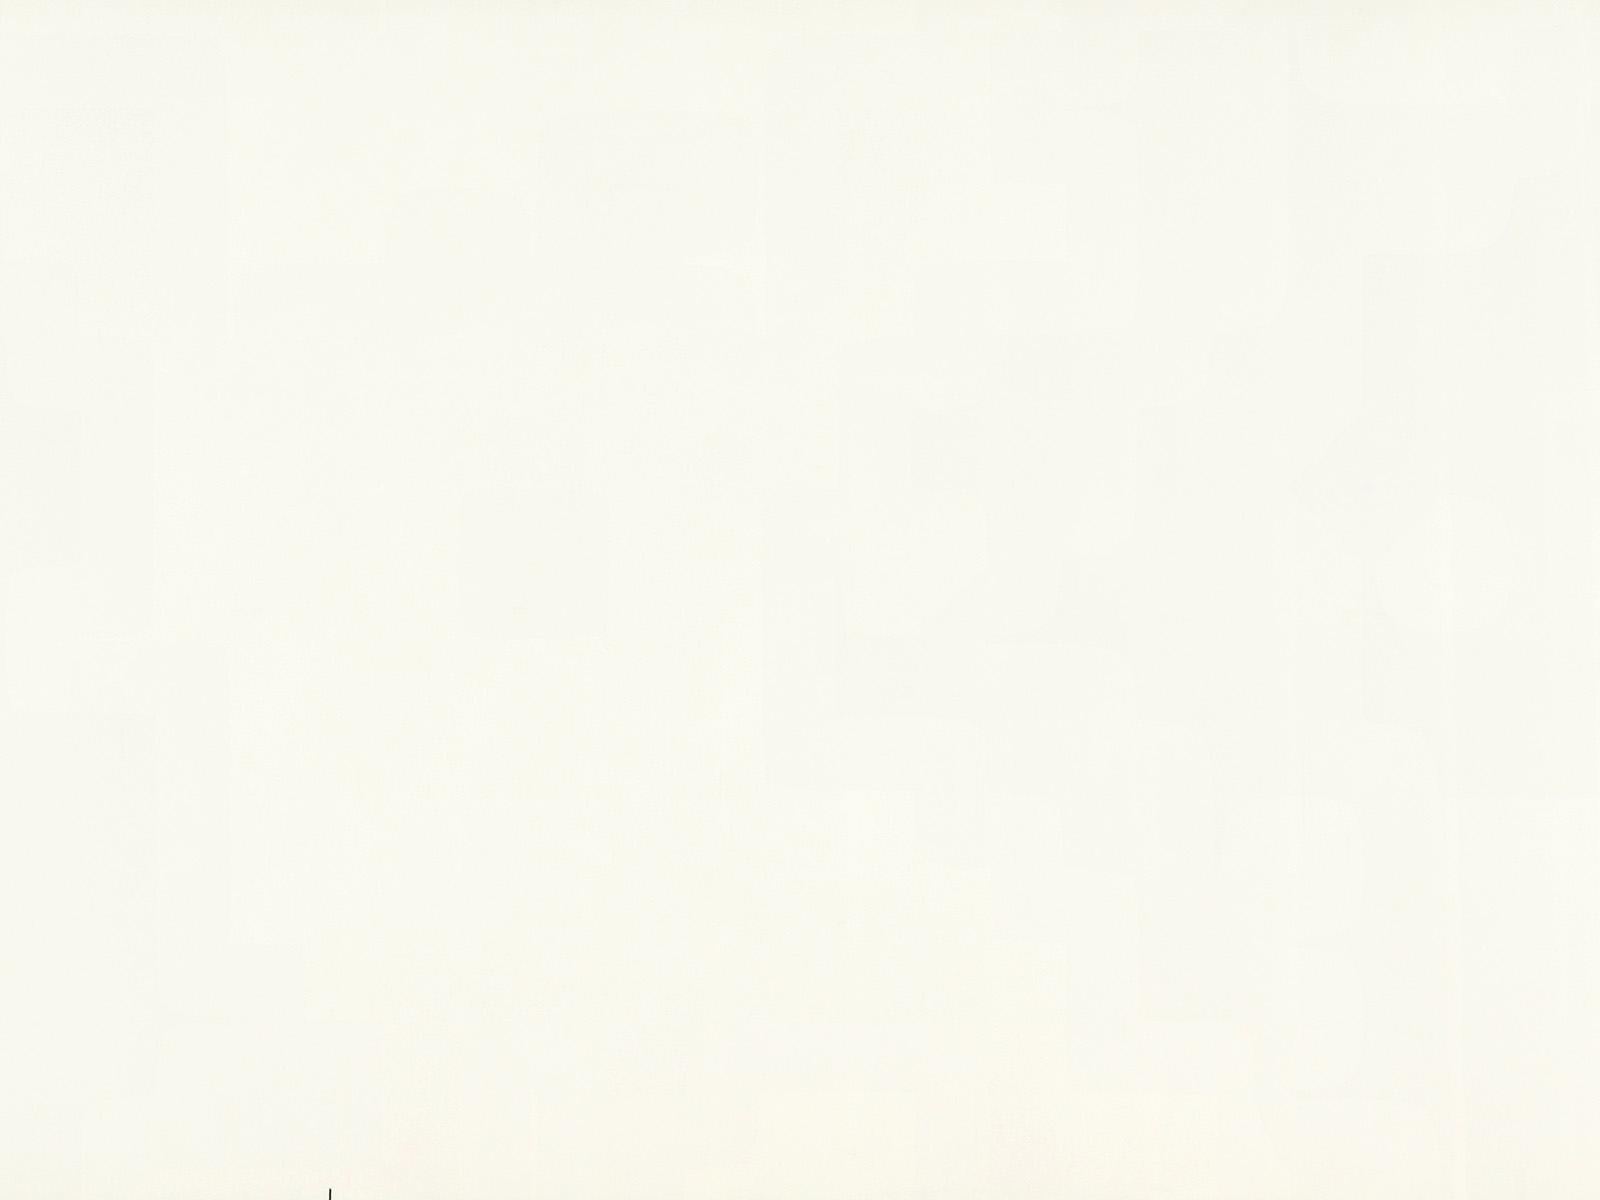 View of Porcelain - A-Tech Biancopuro 2cm